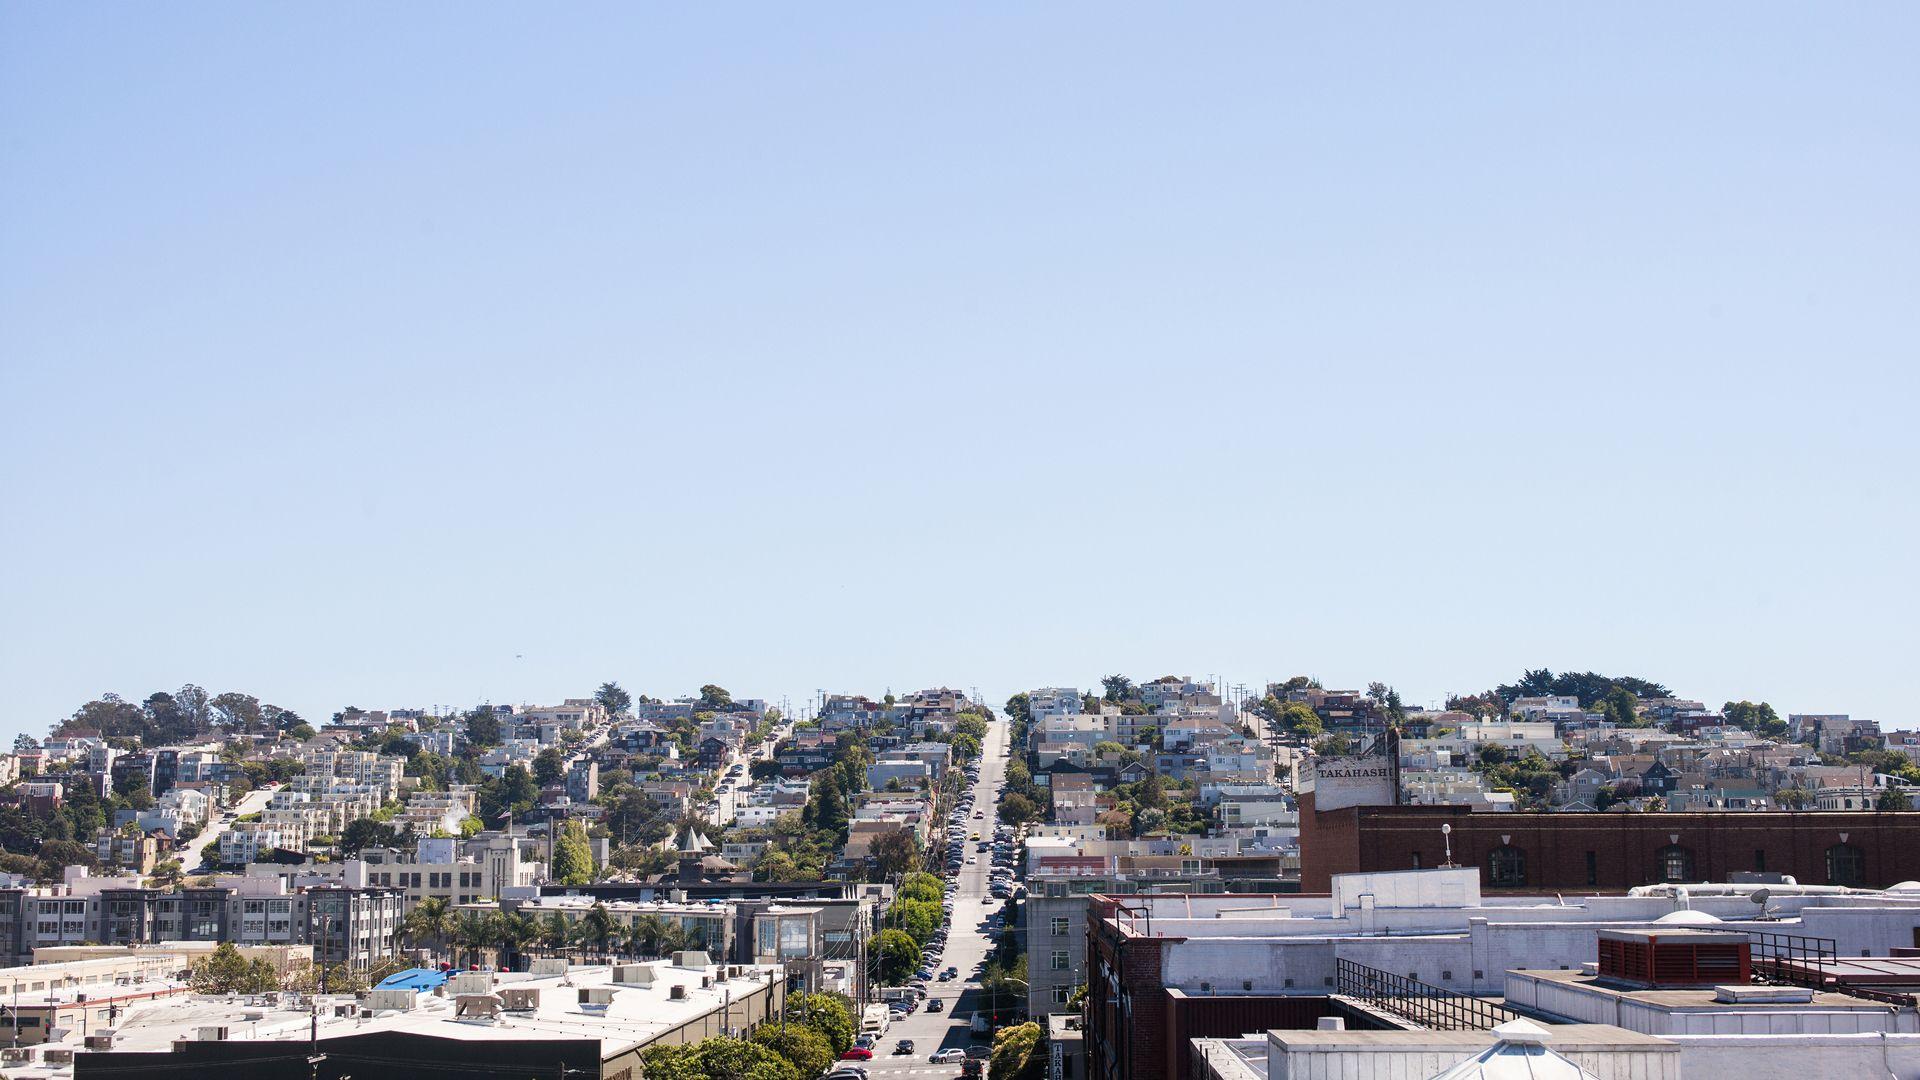 One Henry Adams Apartments - Neighborhood